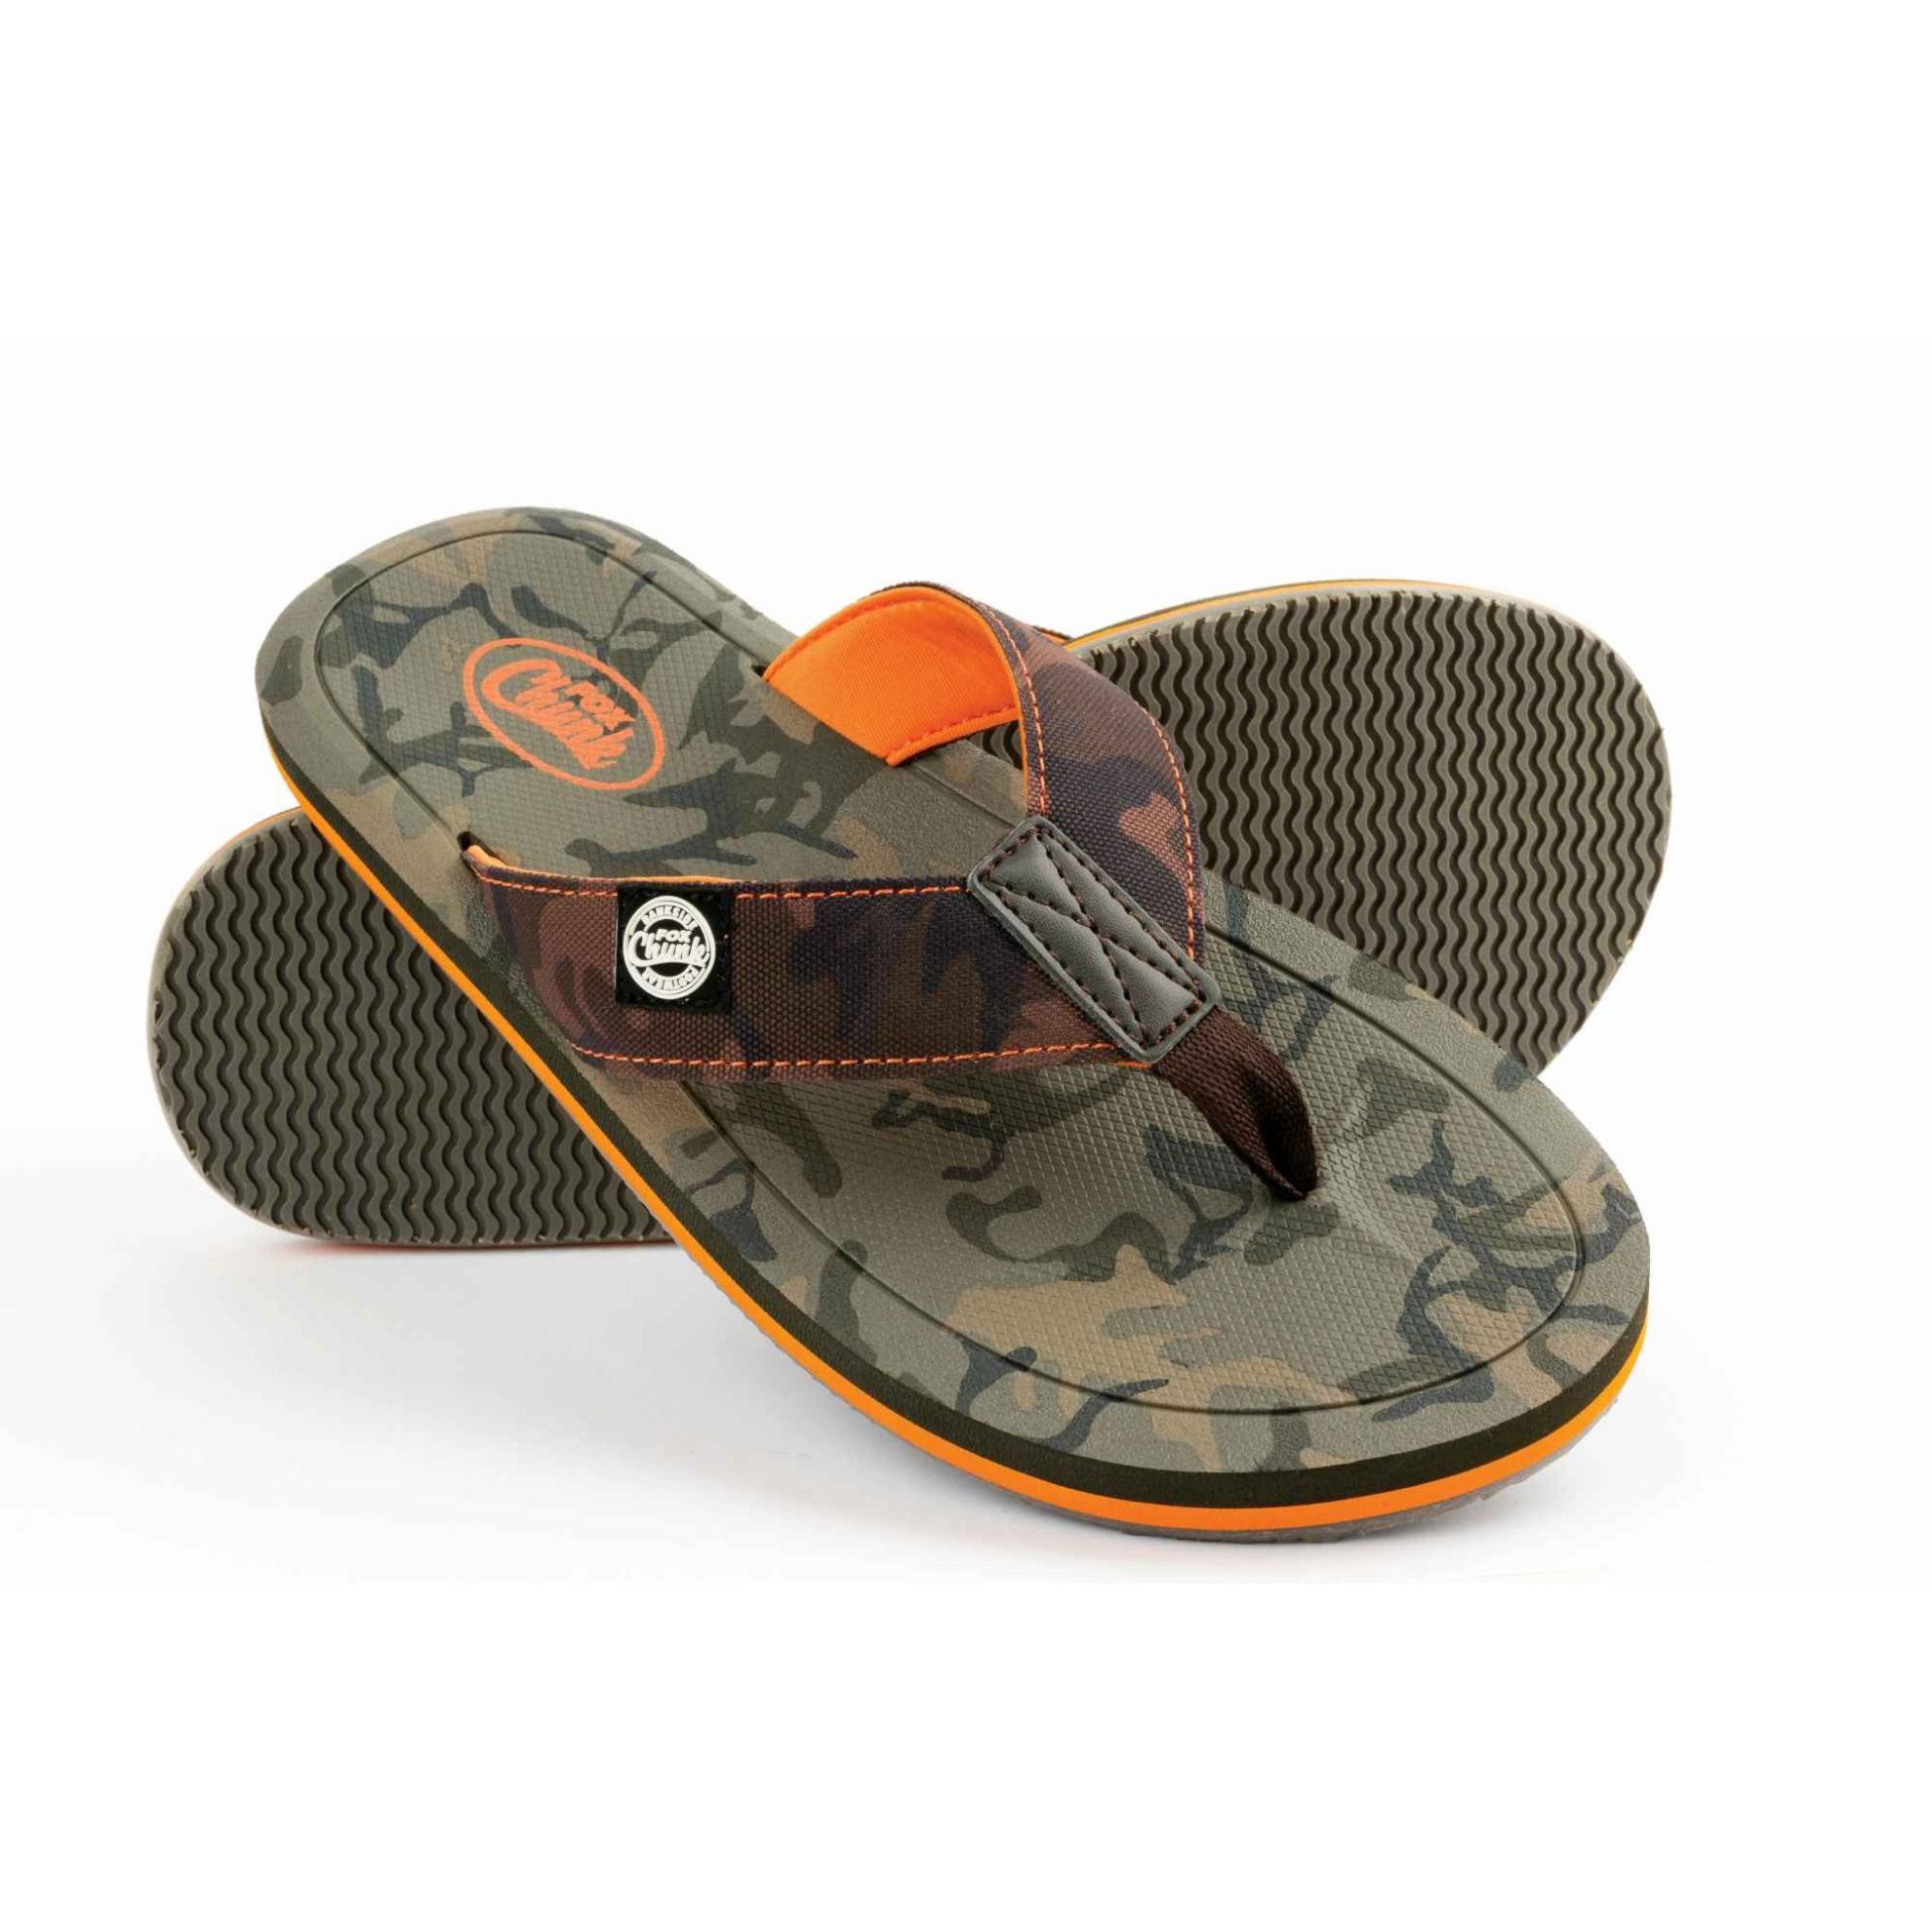 6c61f60b8c7b Fox Chunk Camo Flip Flops